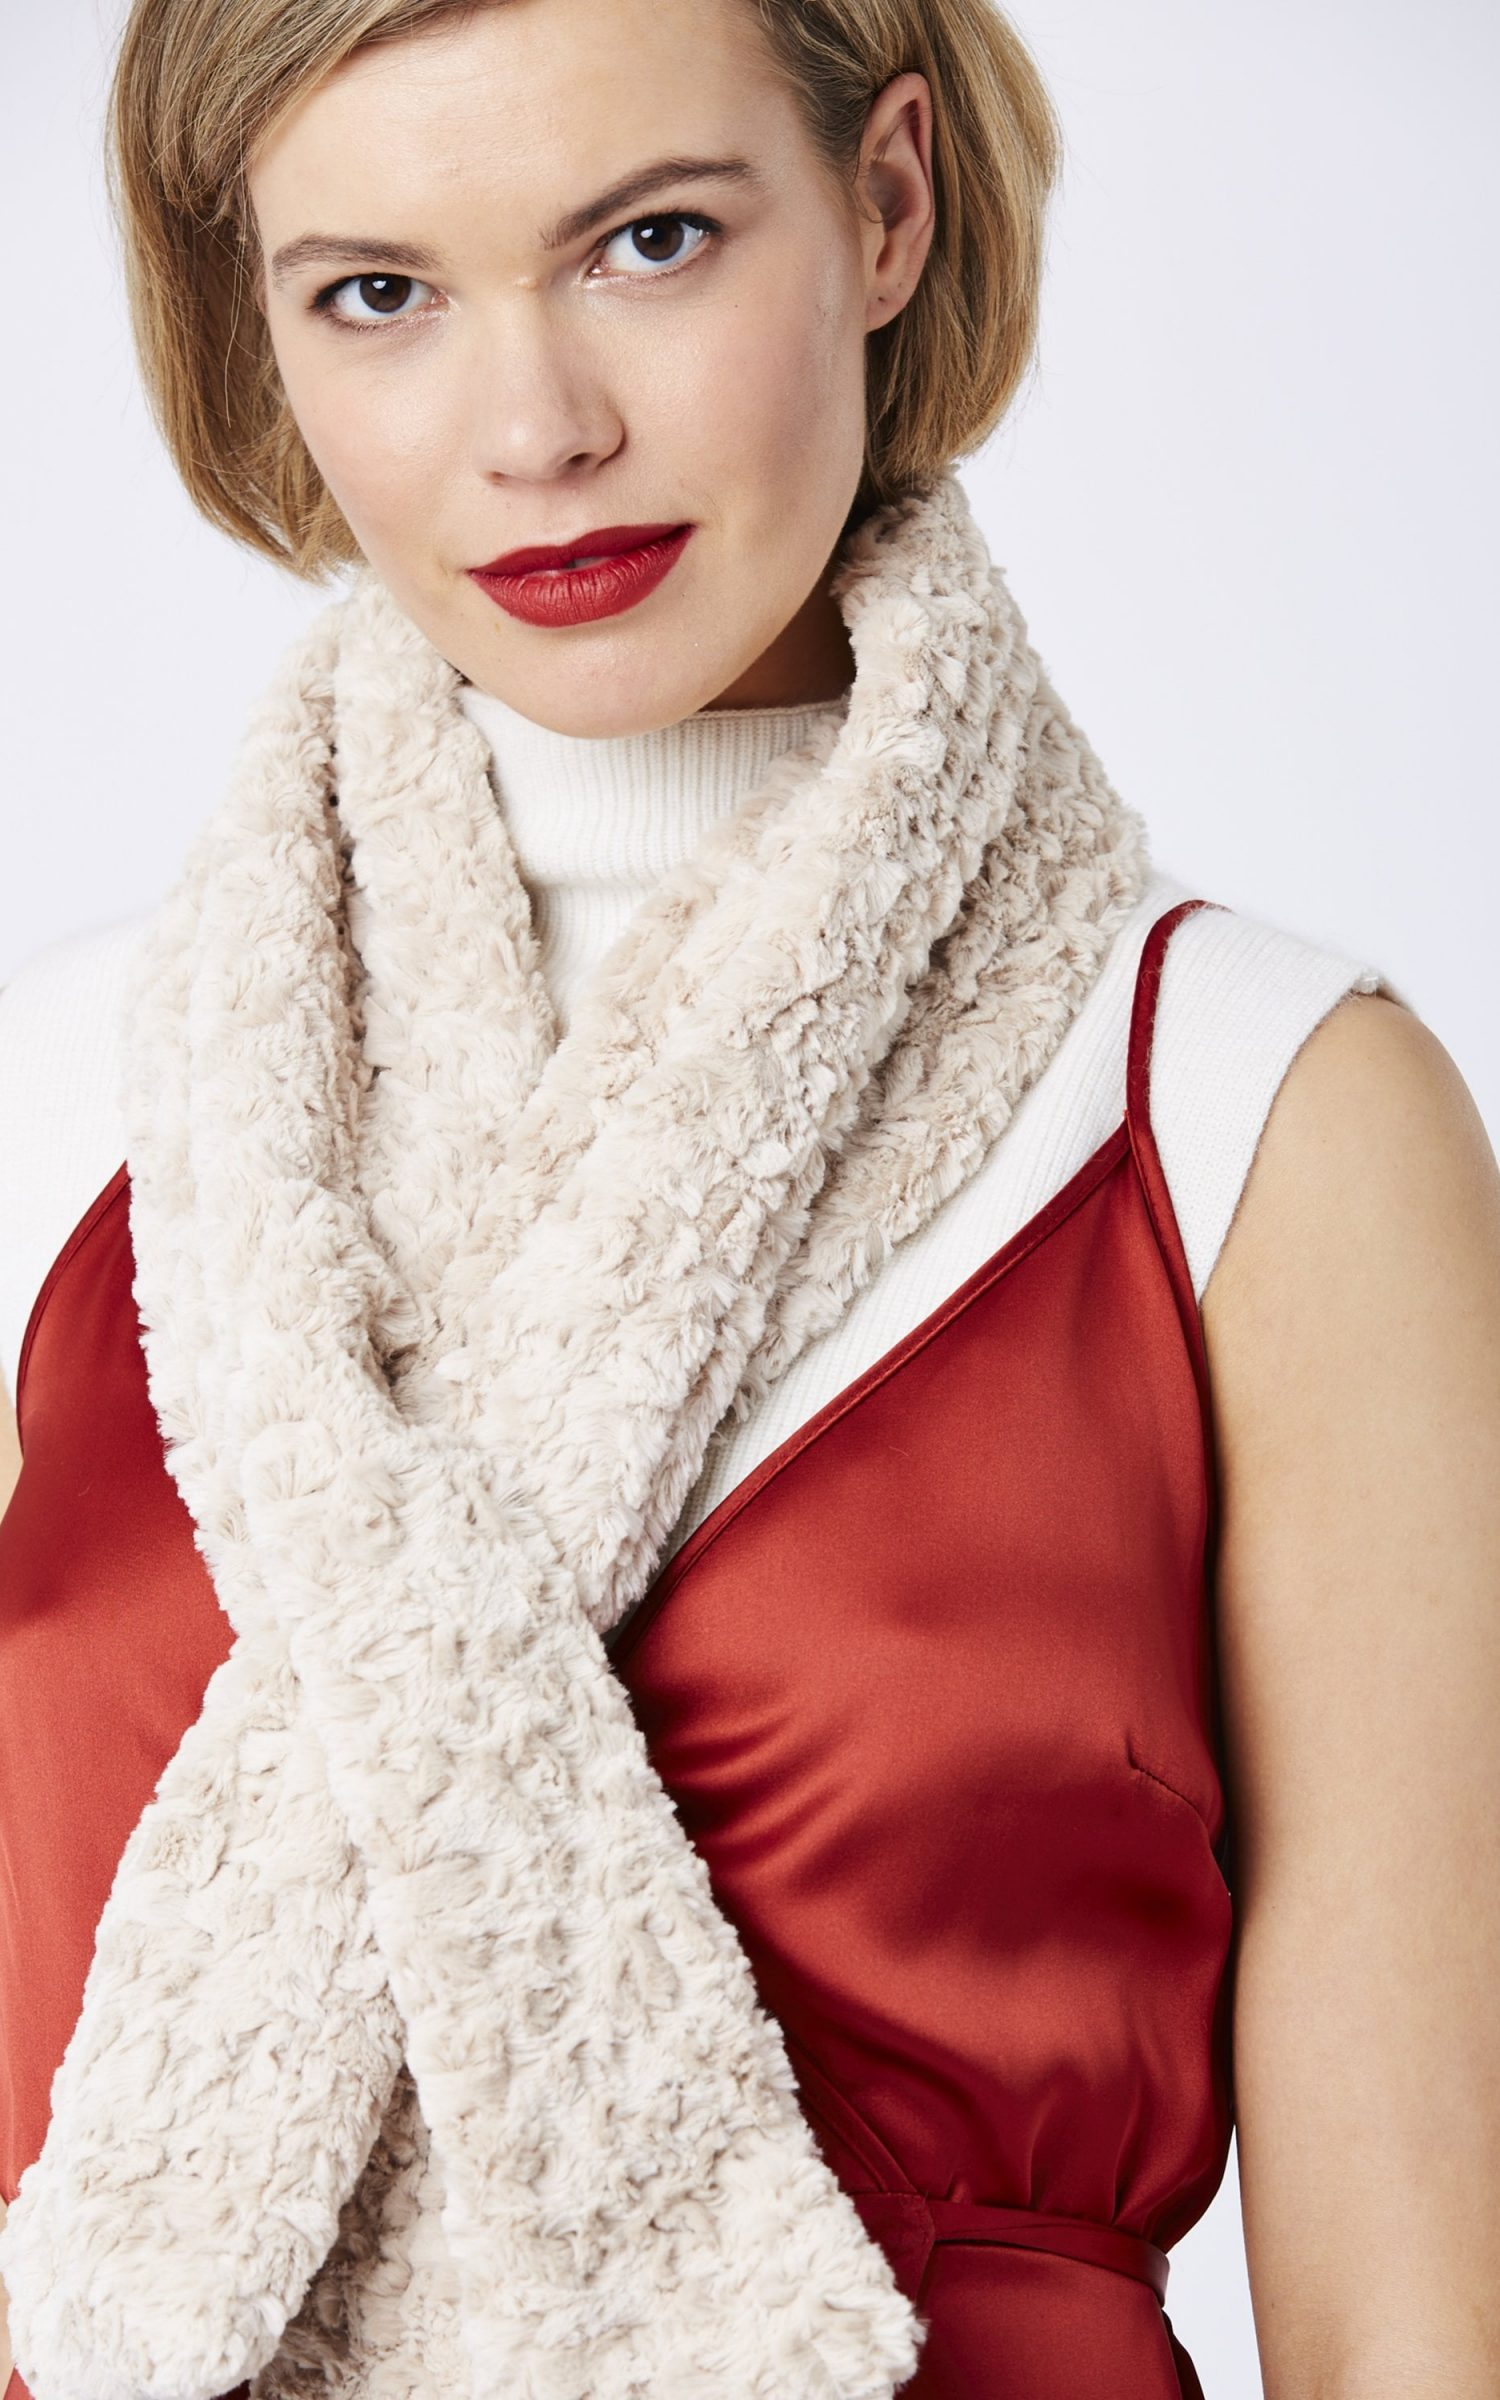 jayley-faux-fur-scarf-p1189-18603_zoom-1